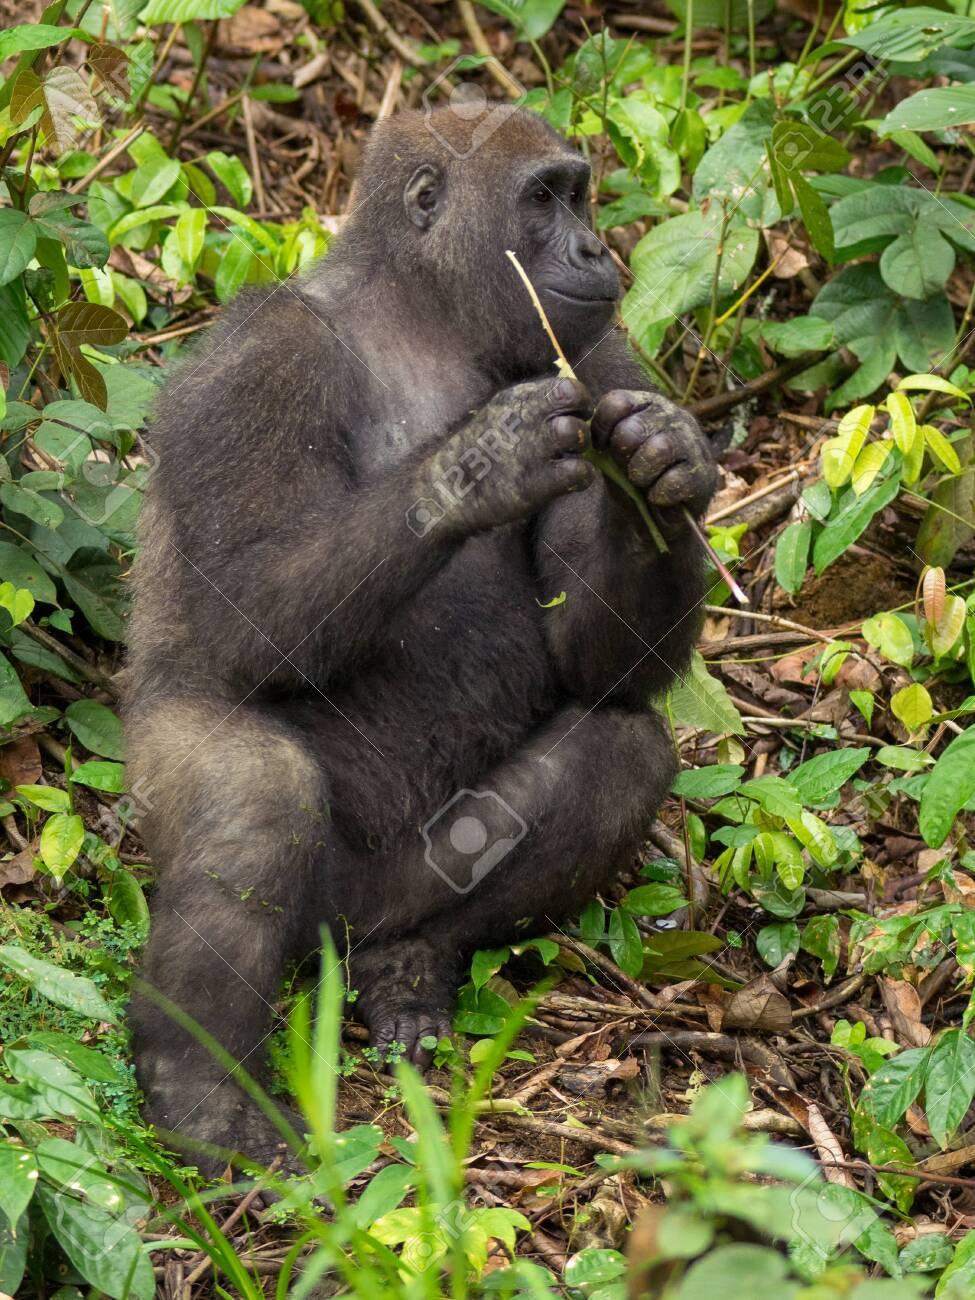 Gorilla in Gabon Endangered eastern gorilla in the beauty of african jungle (Gorilla gorilla) - 127159887